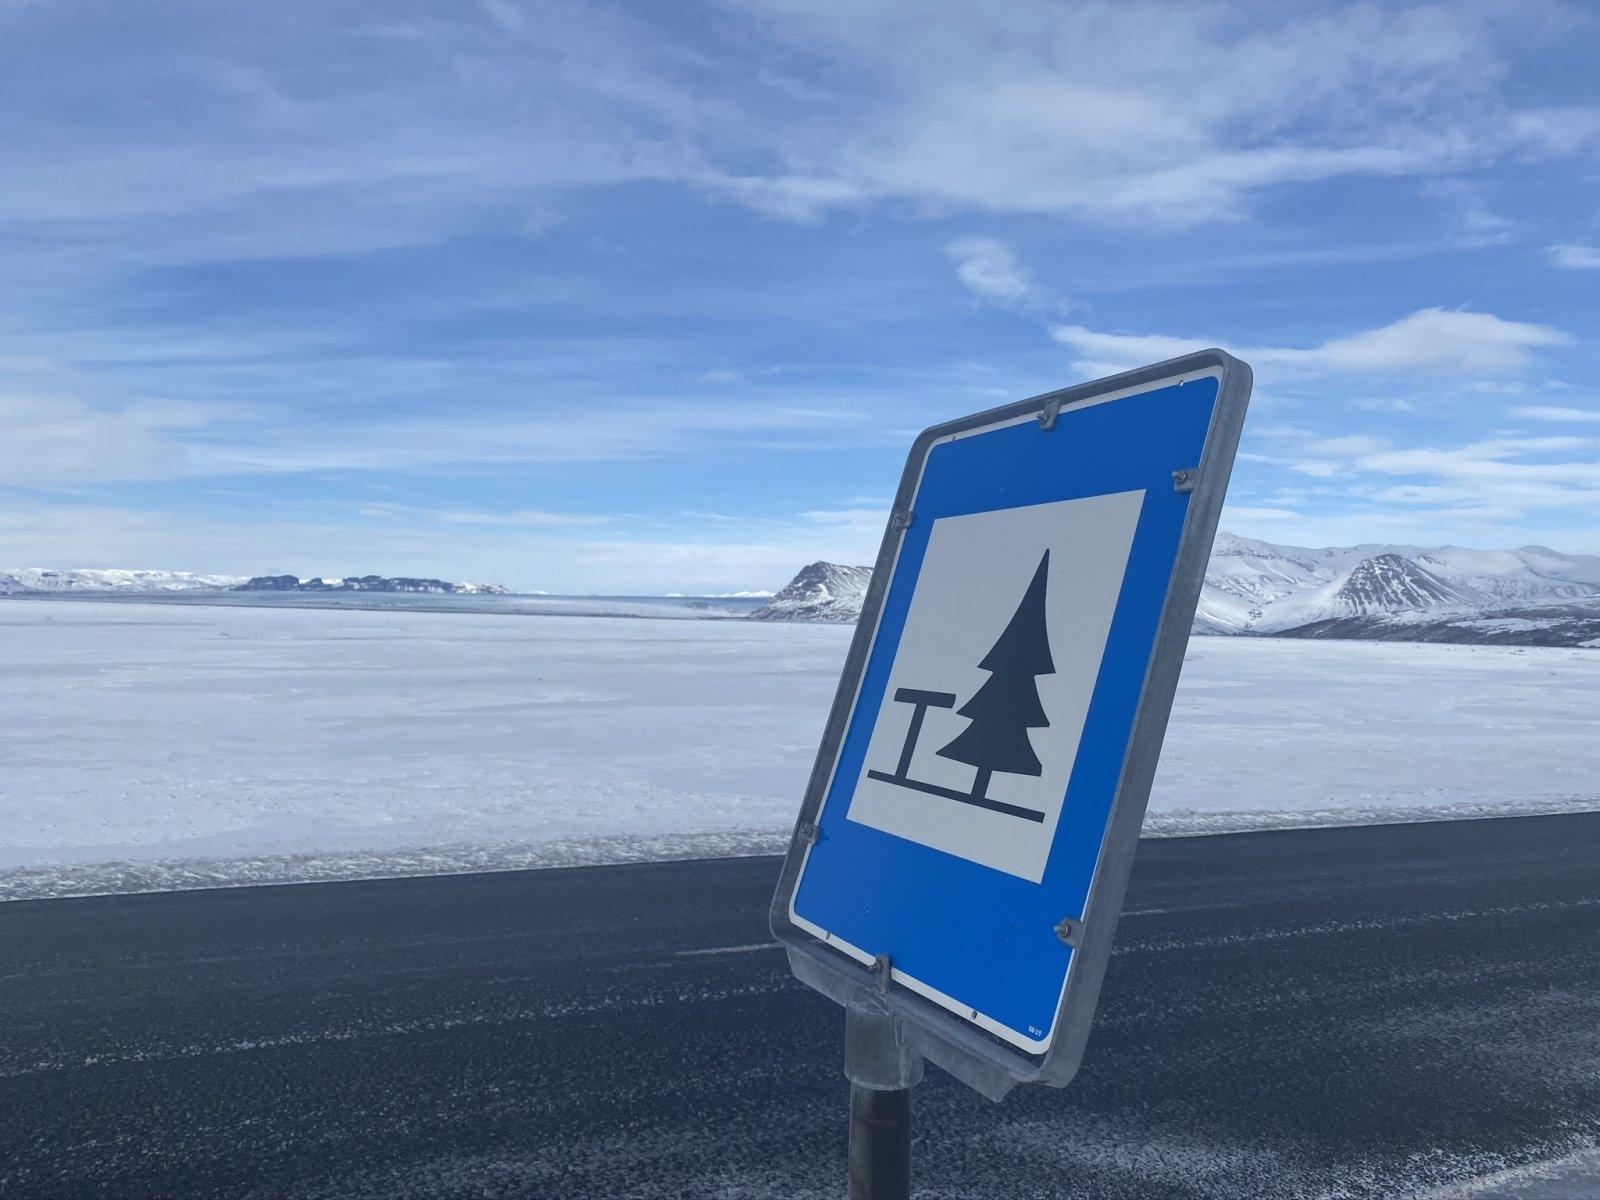 Парковка у ледника в Исландии, фото Стасмир, Photo Stasmir